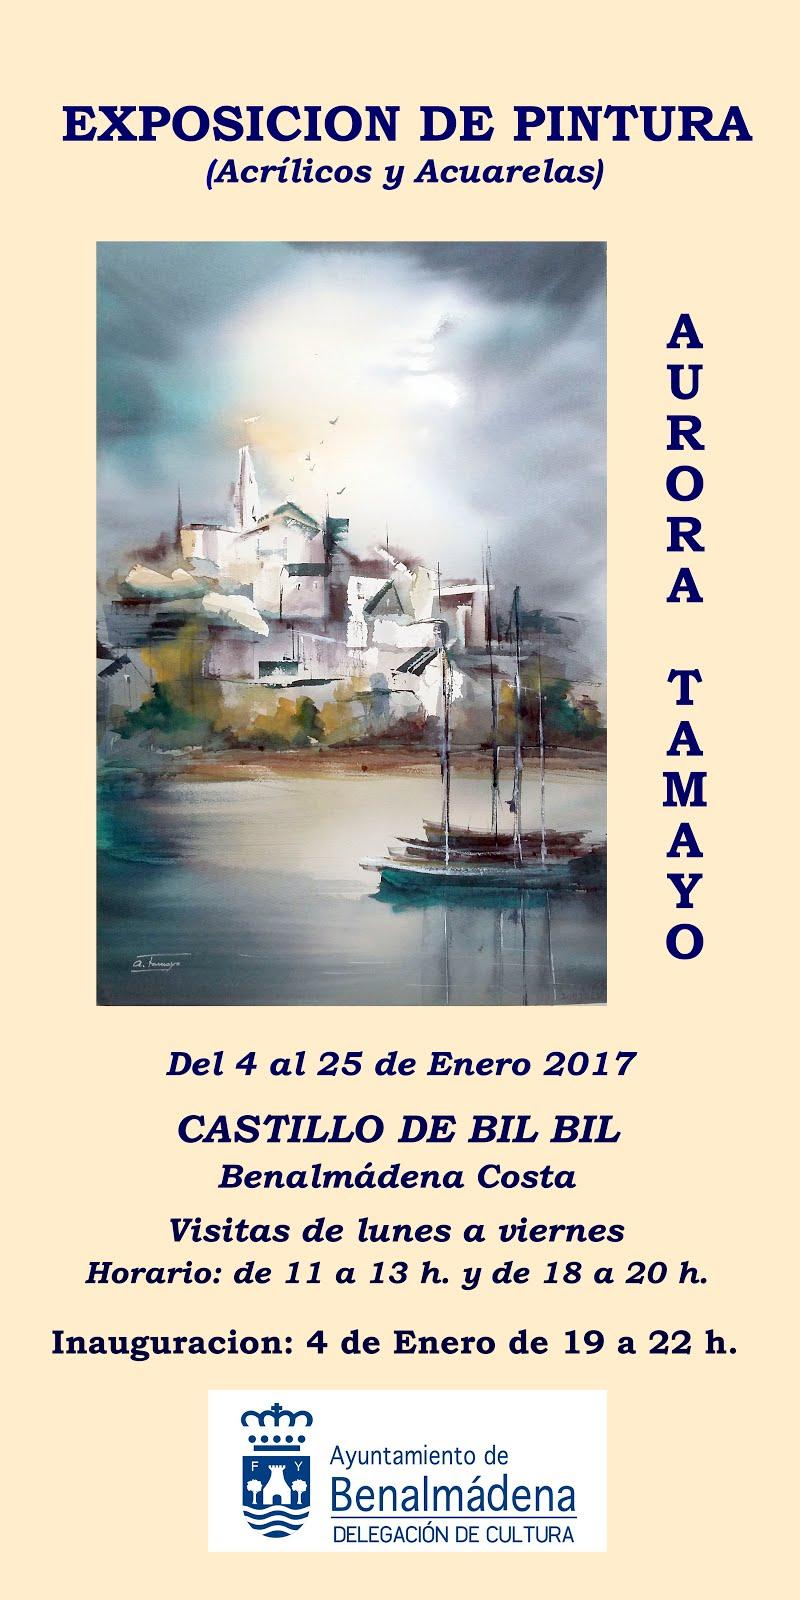 Exposición en Castillo de Bil Bil en Benalmádena